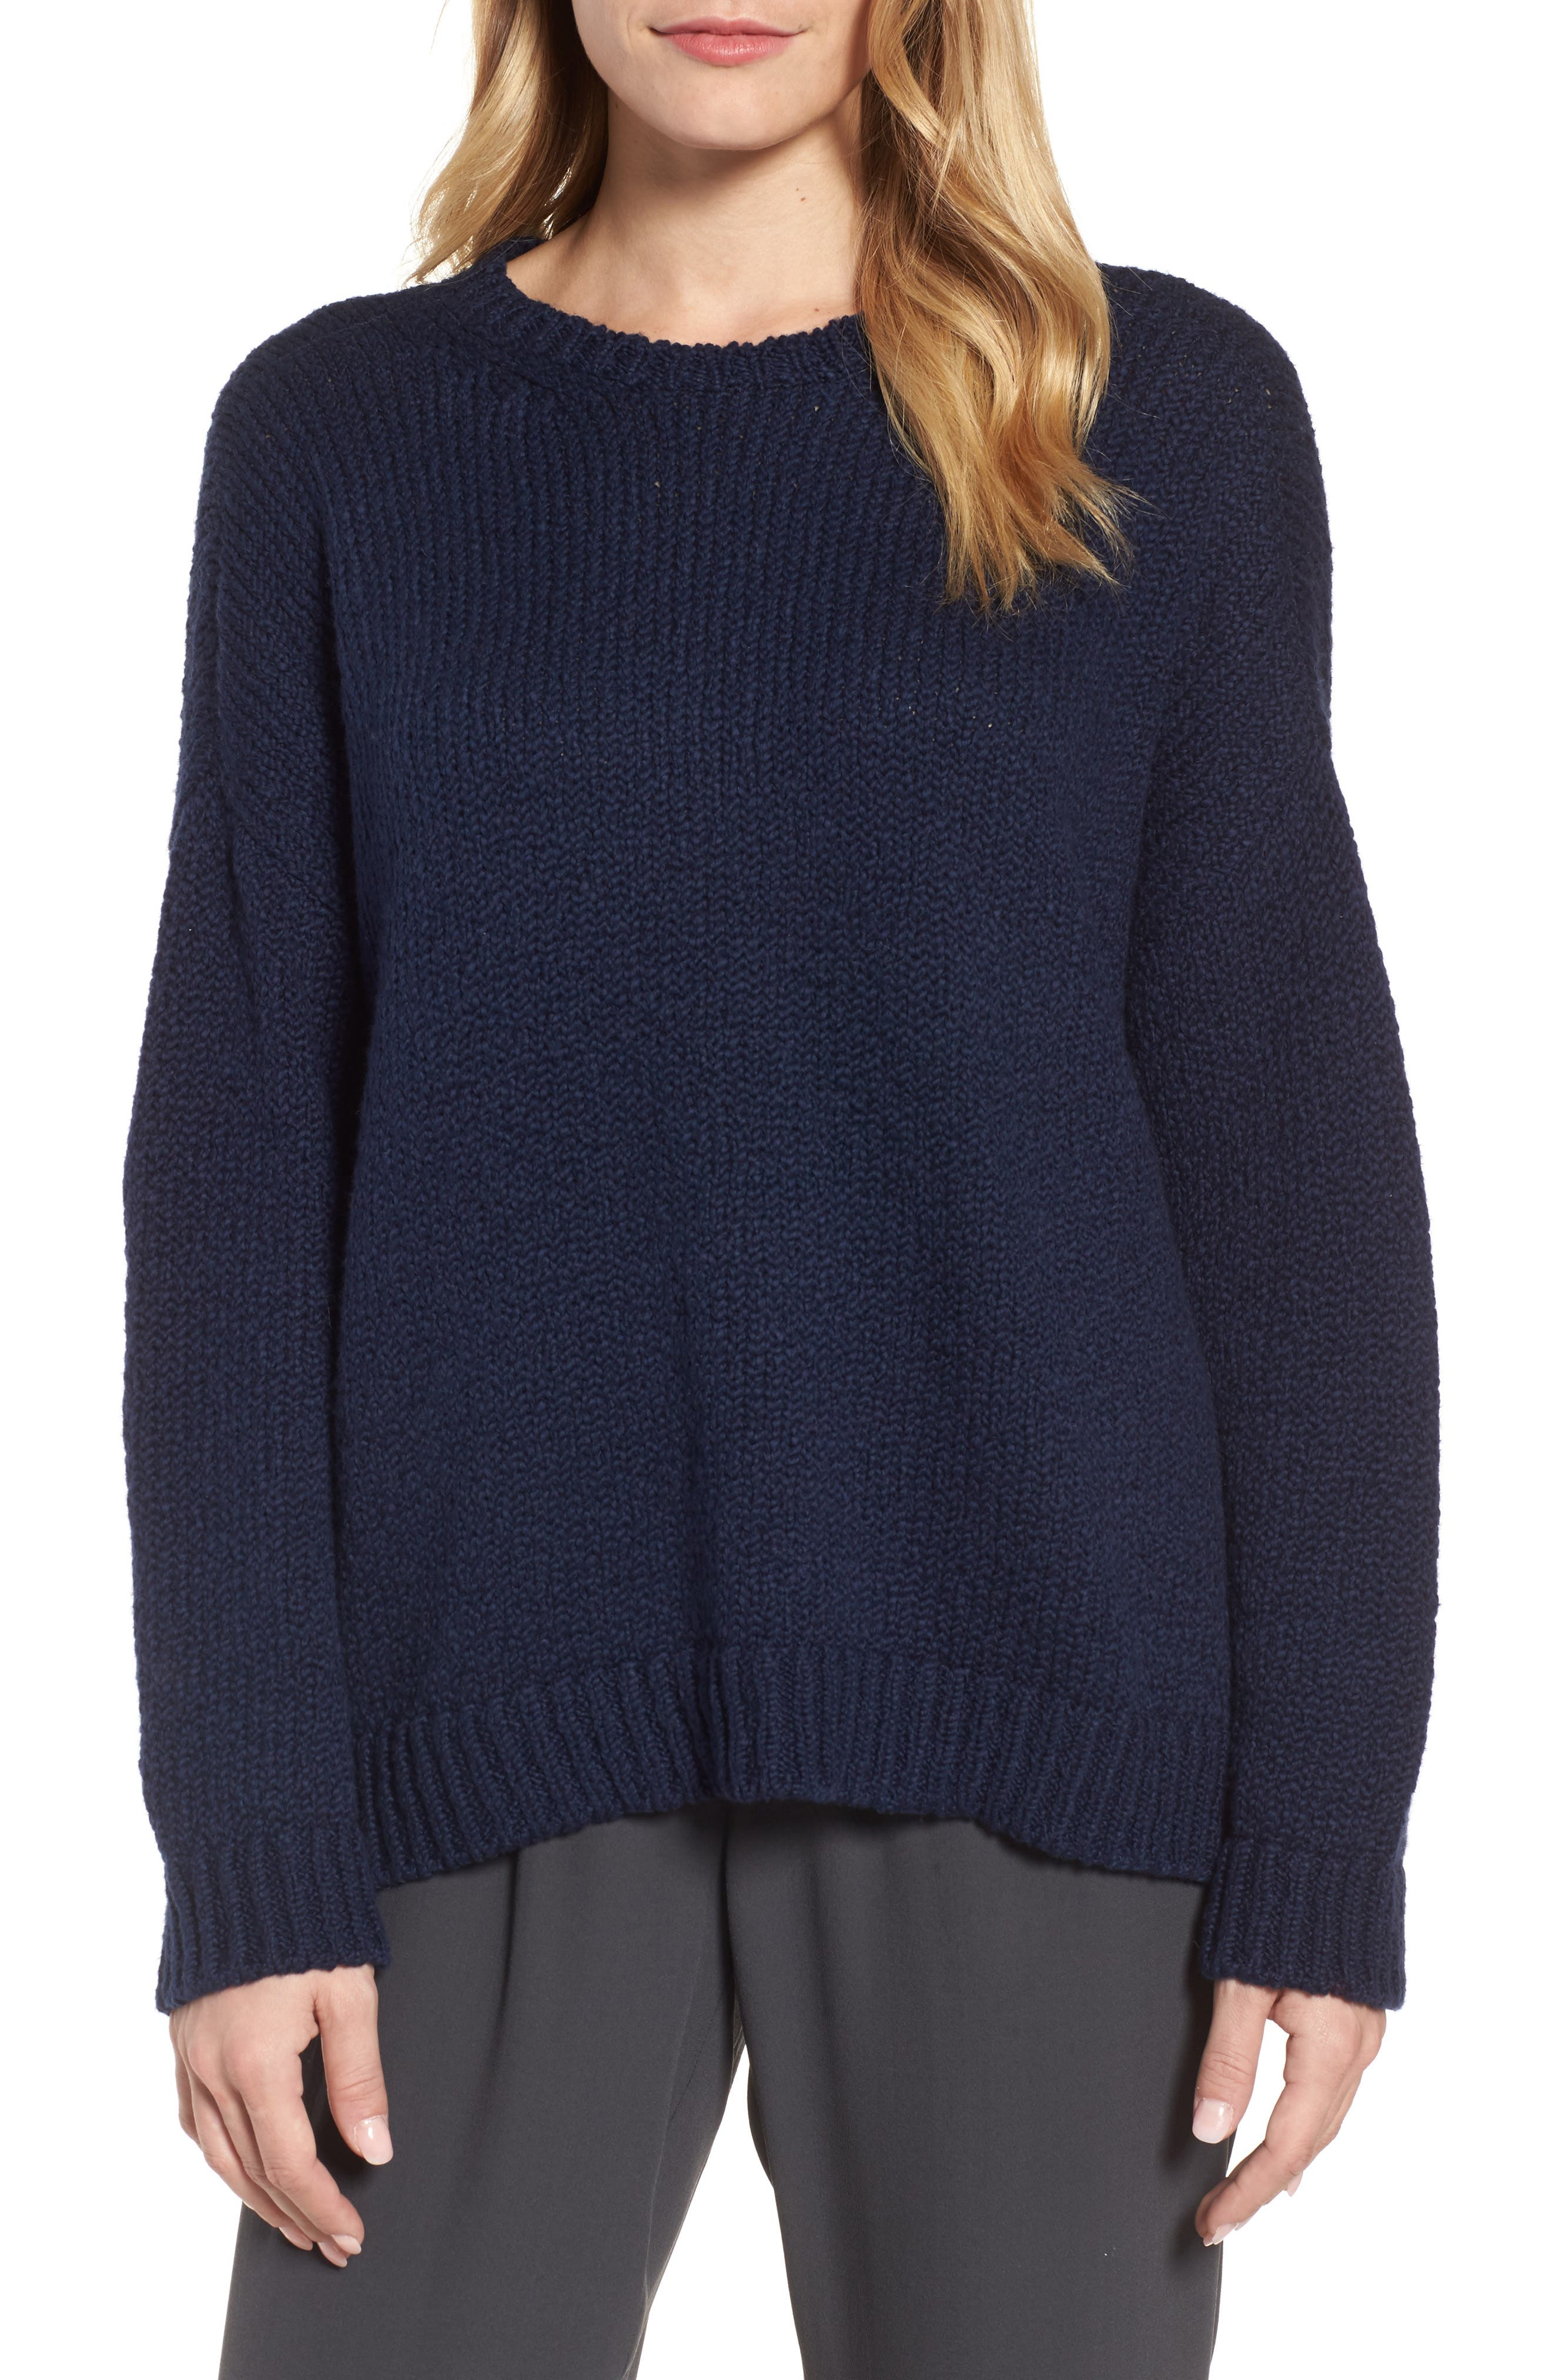 Organic Cotton Crewneck Sweater,                             Main thumbnail 1, color,                             Midnight